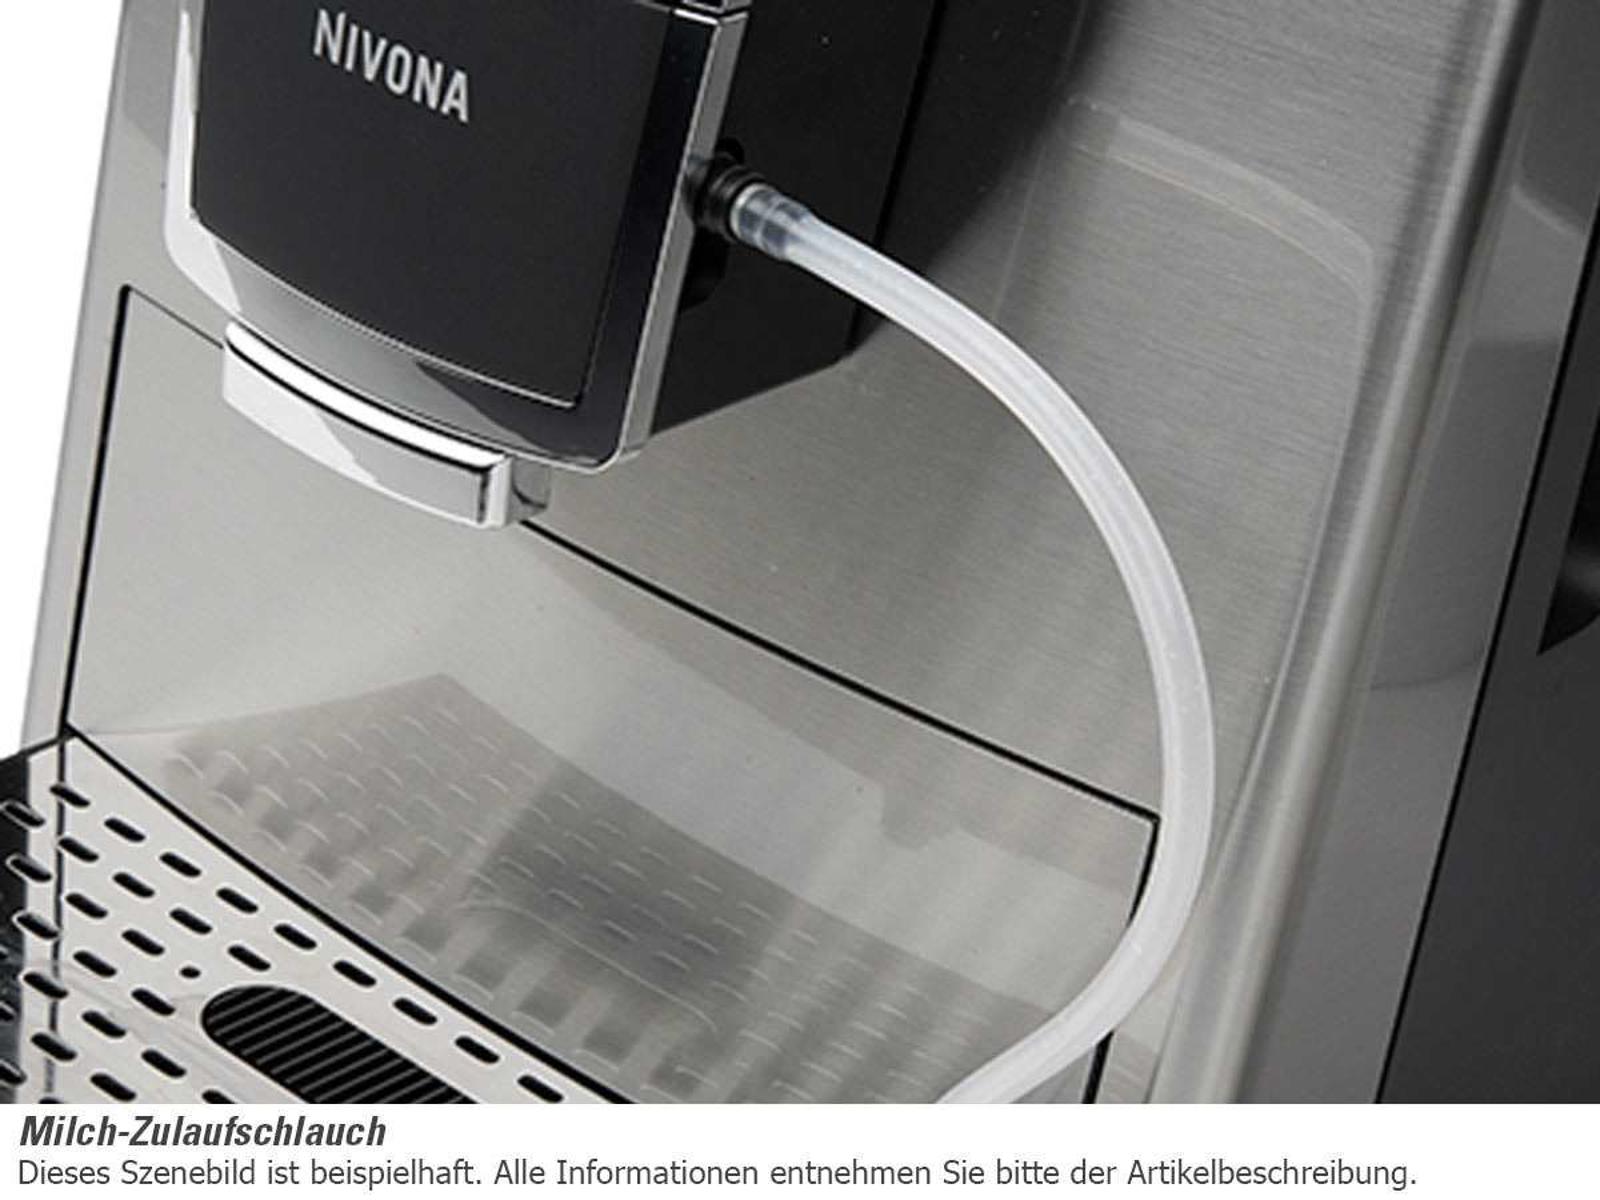 nivona caferomatica 877 stand espresso kaffeevollautomat. Black Bedroom Furniture Sets. Home Design Ideas